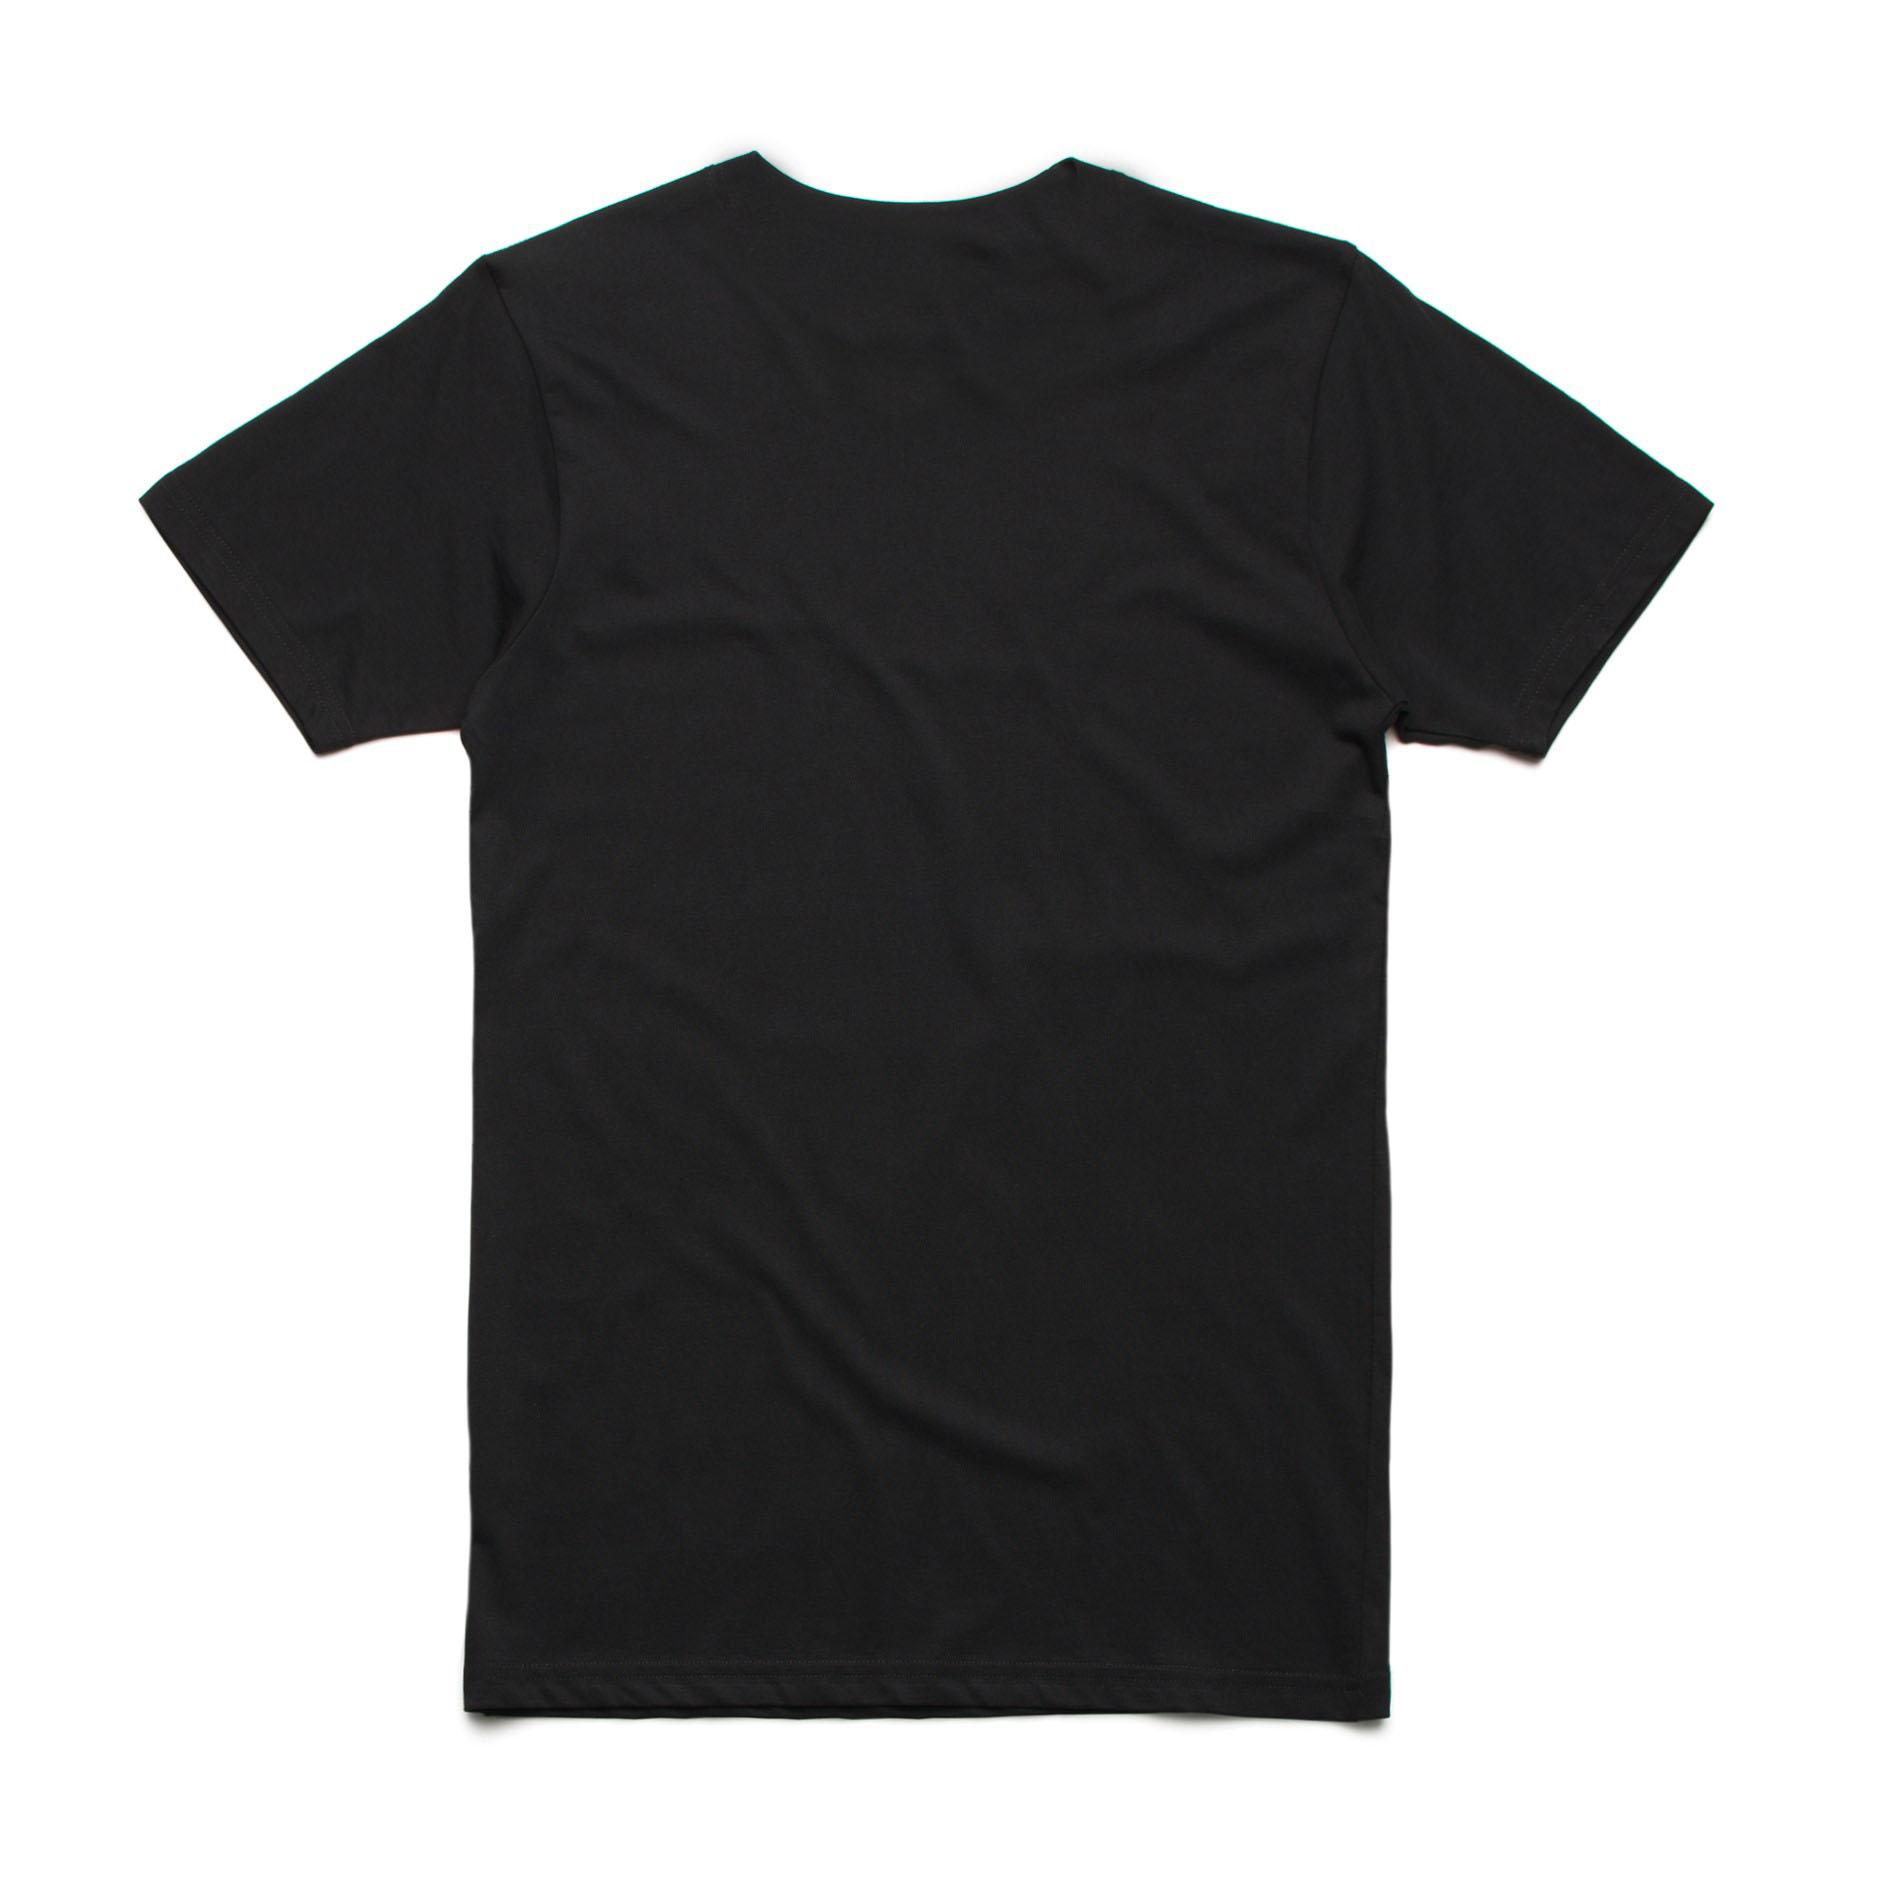 7003aac1482b2 Unisex Organic Tee T Shirt Printing & T Shirt Design | Digitees